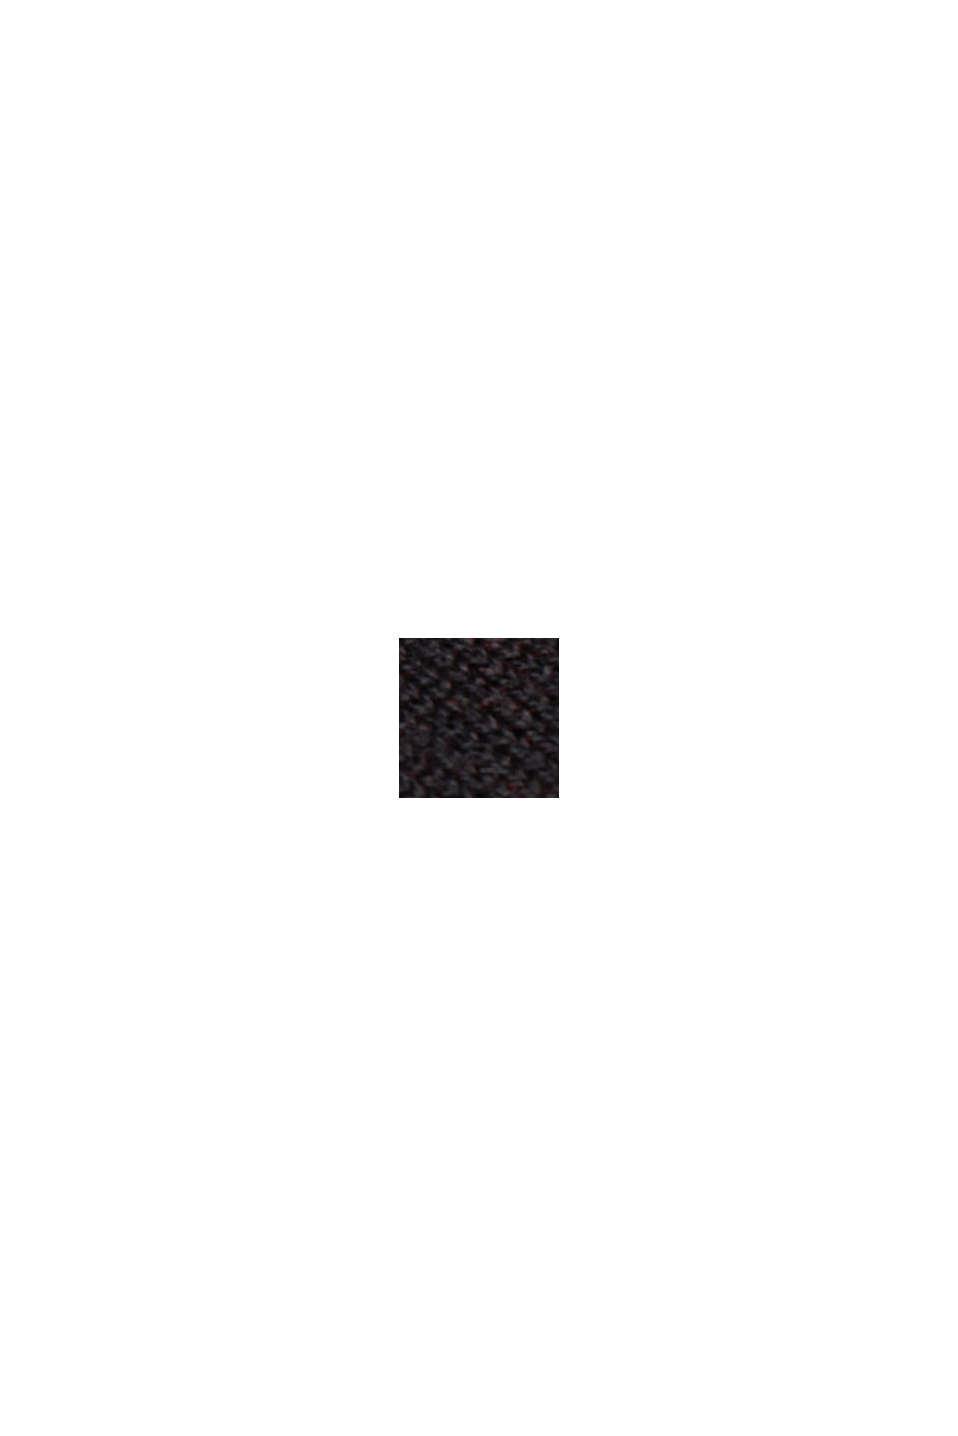 Pull-over en fine maille de coton bio, BLACK, swatch